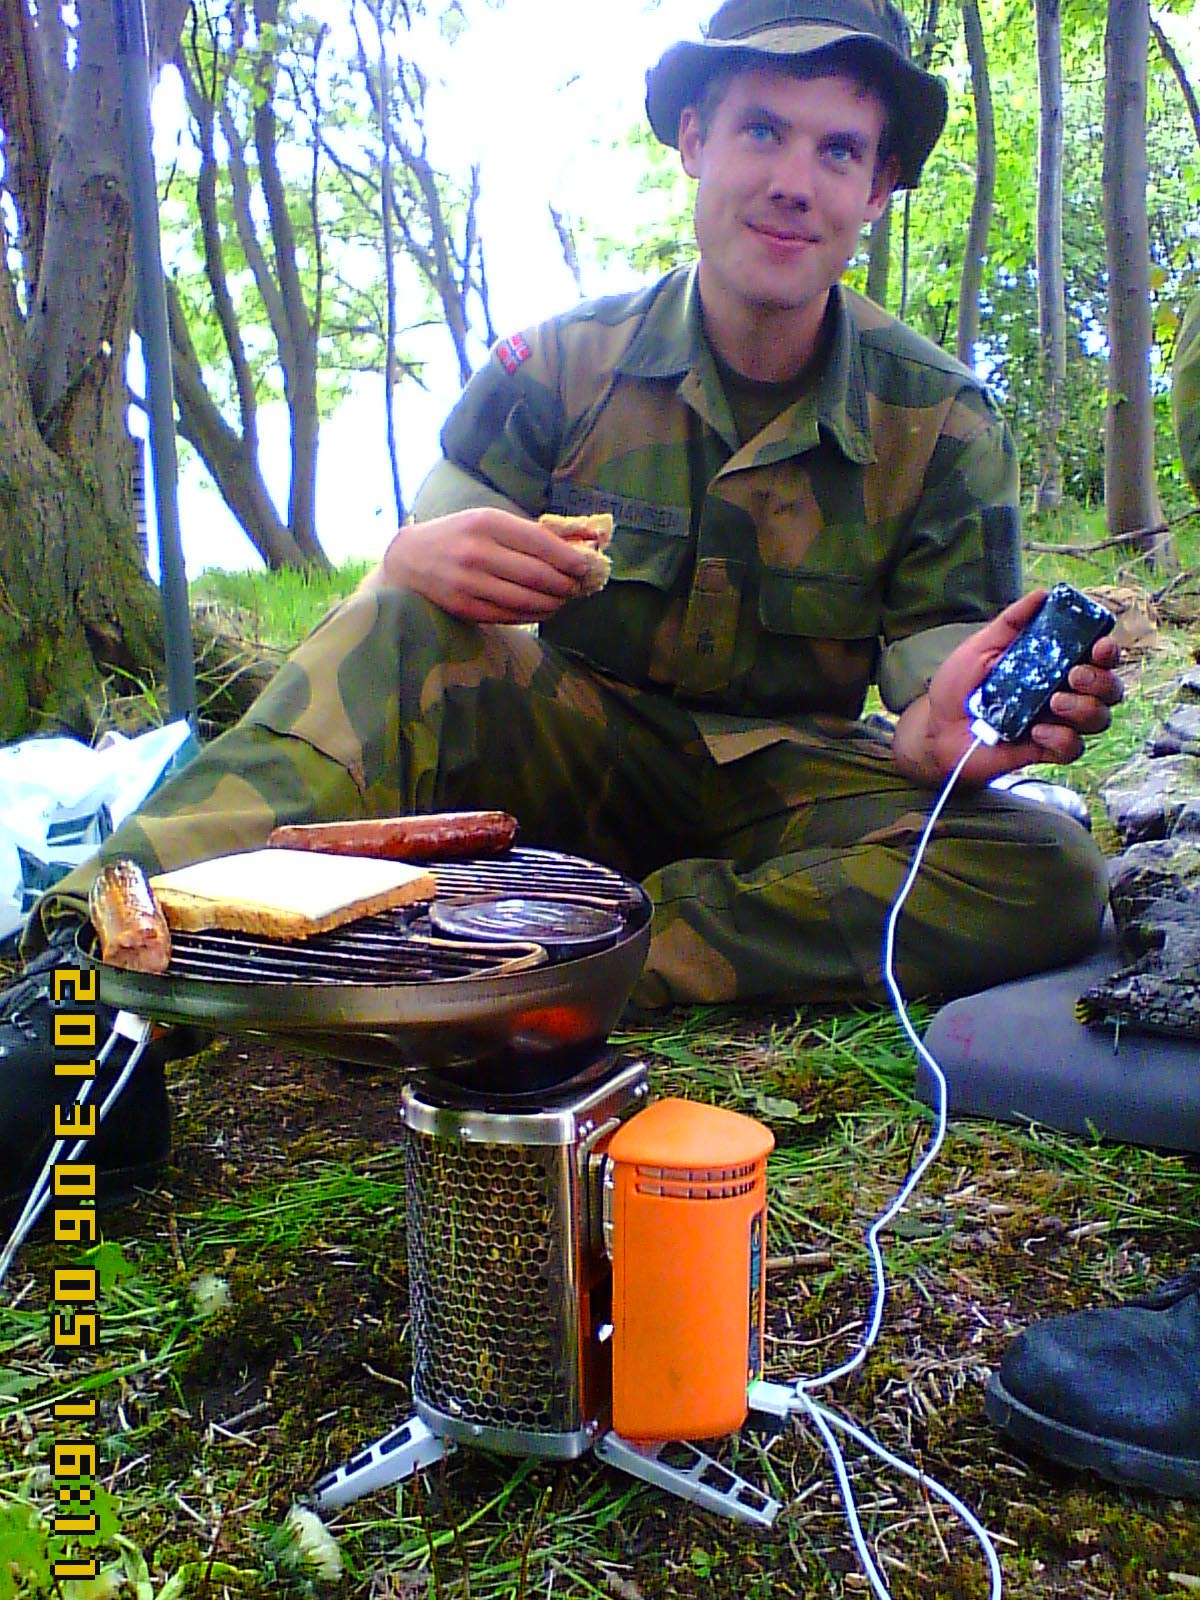 Norwegian Homeguard with BioLite